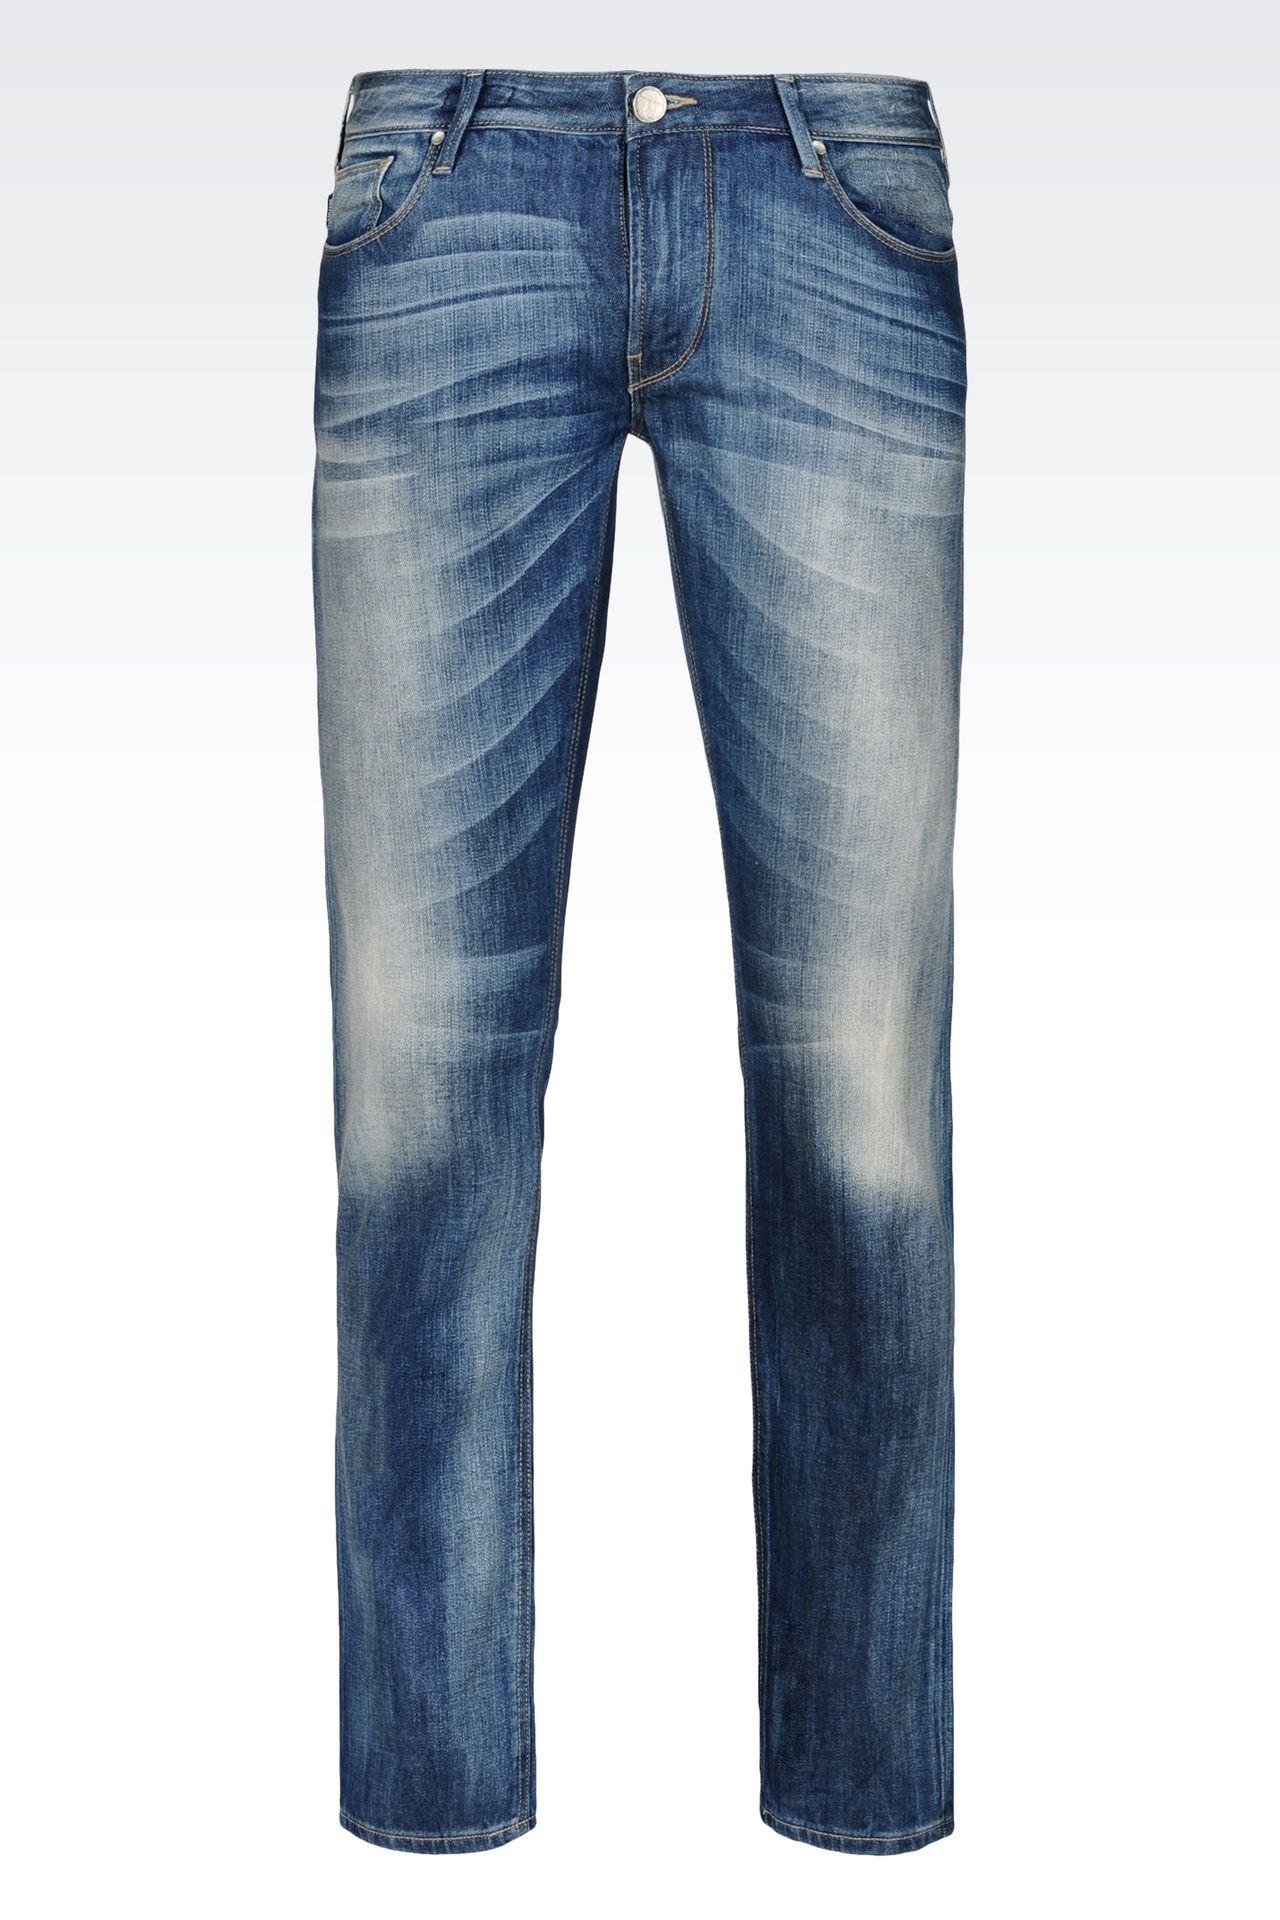 SLIM FIT MEDIUM WASH JEANS: Jeans Men by Armani - 0